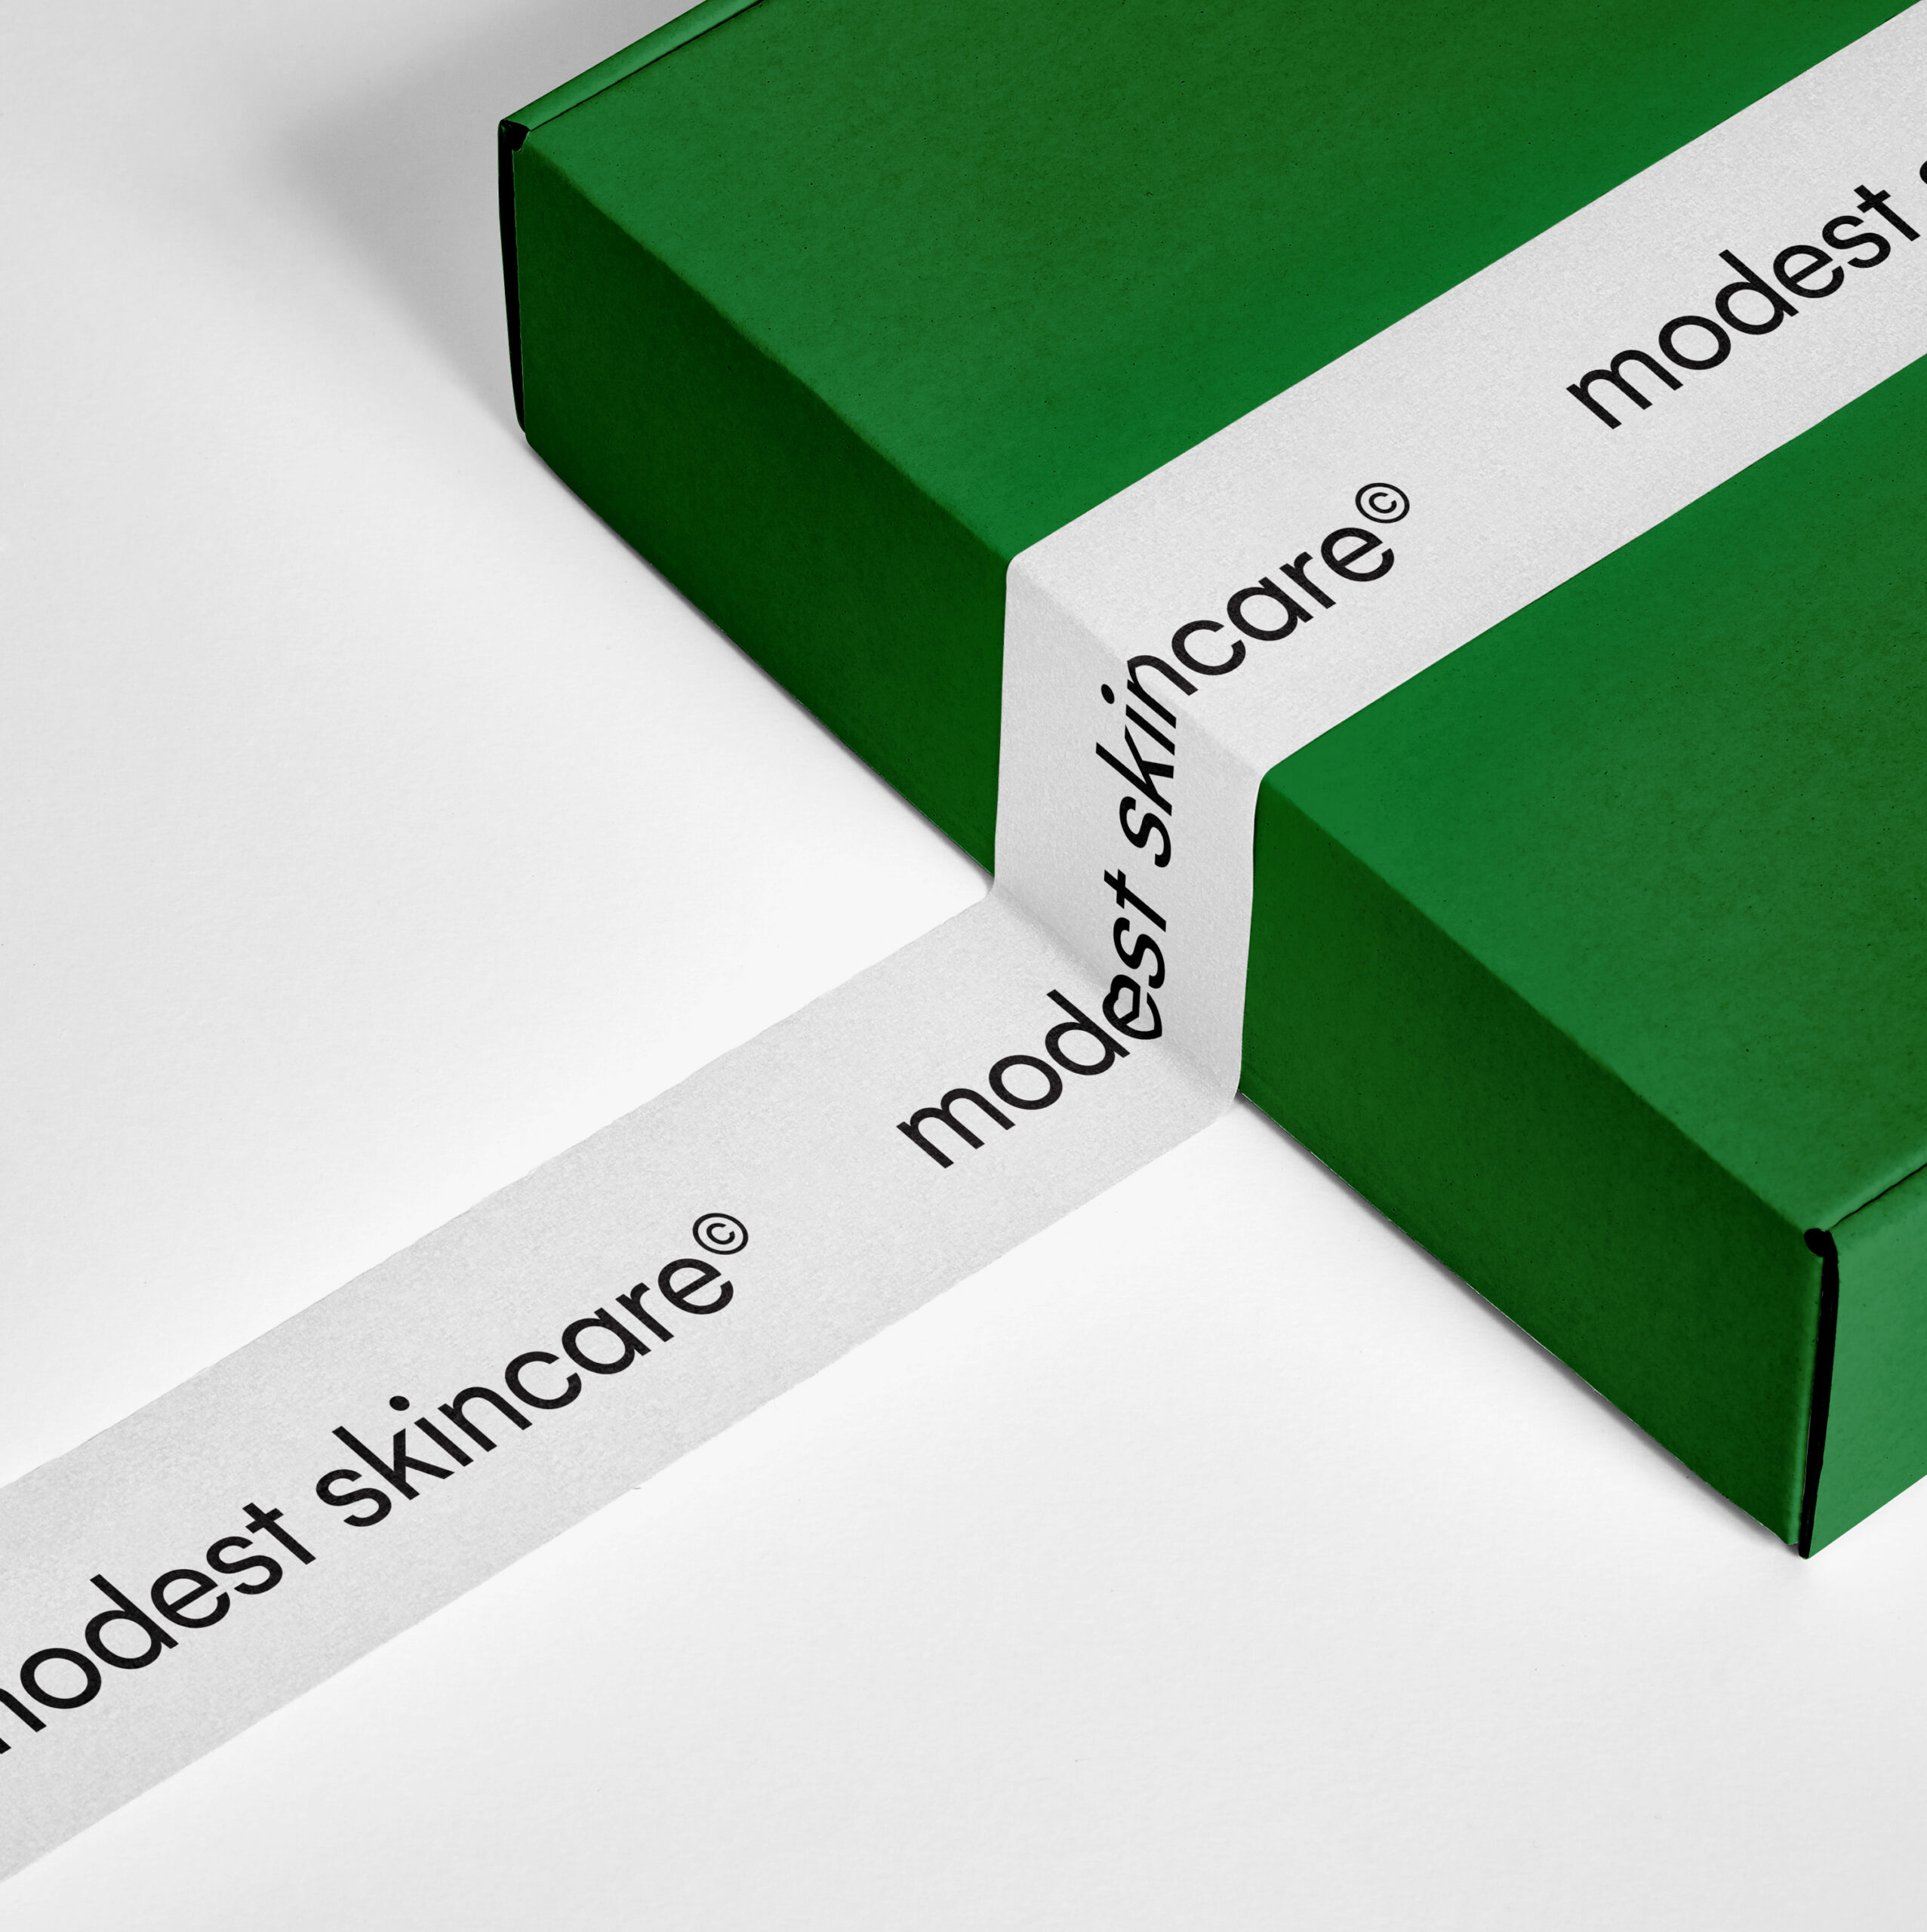 modest-skincare-box-packaging